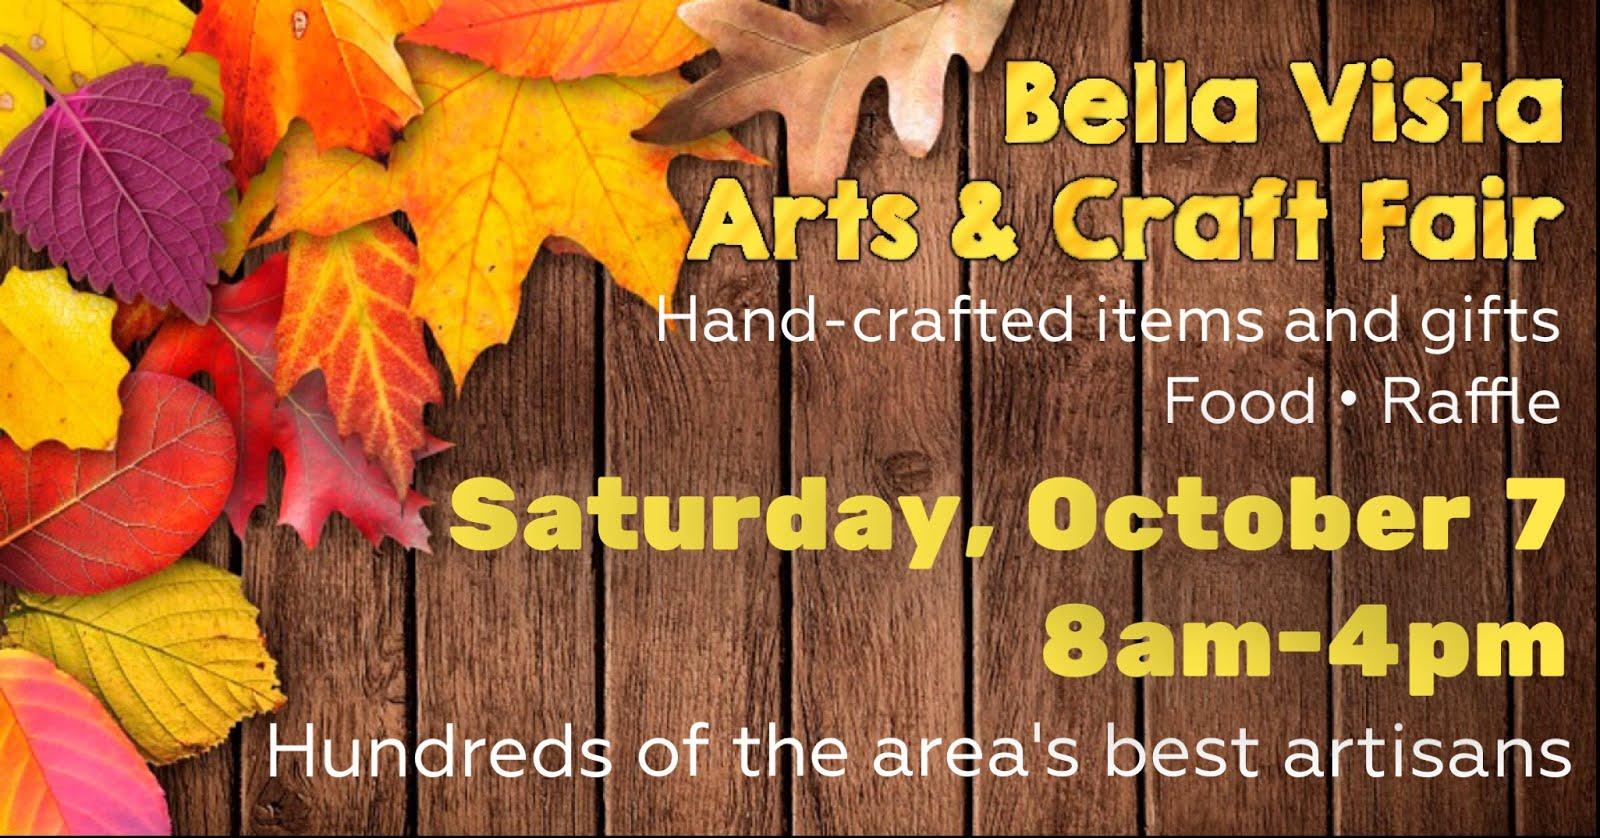 Bella vista Arts and crafts fair 2017.jpg